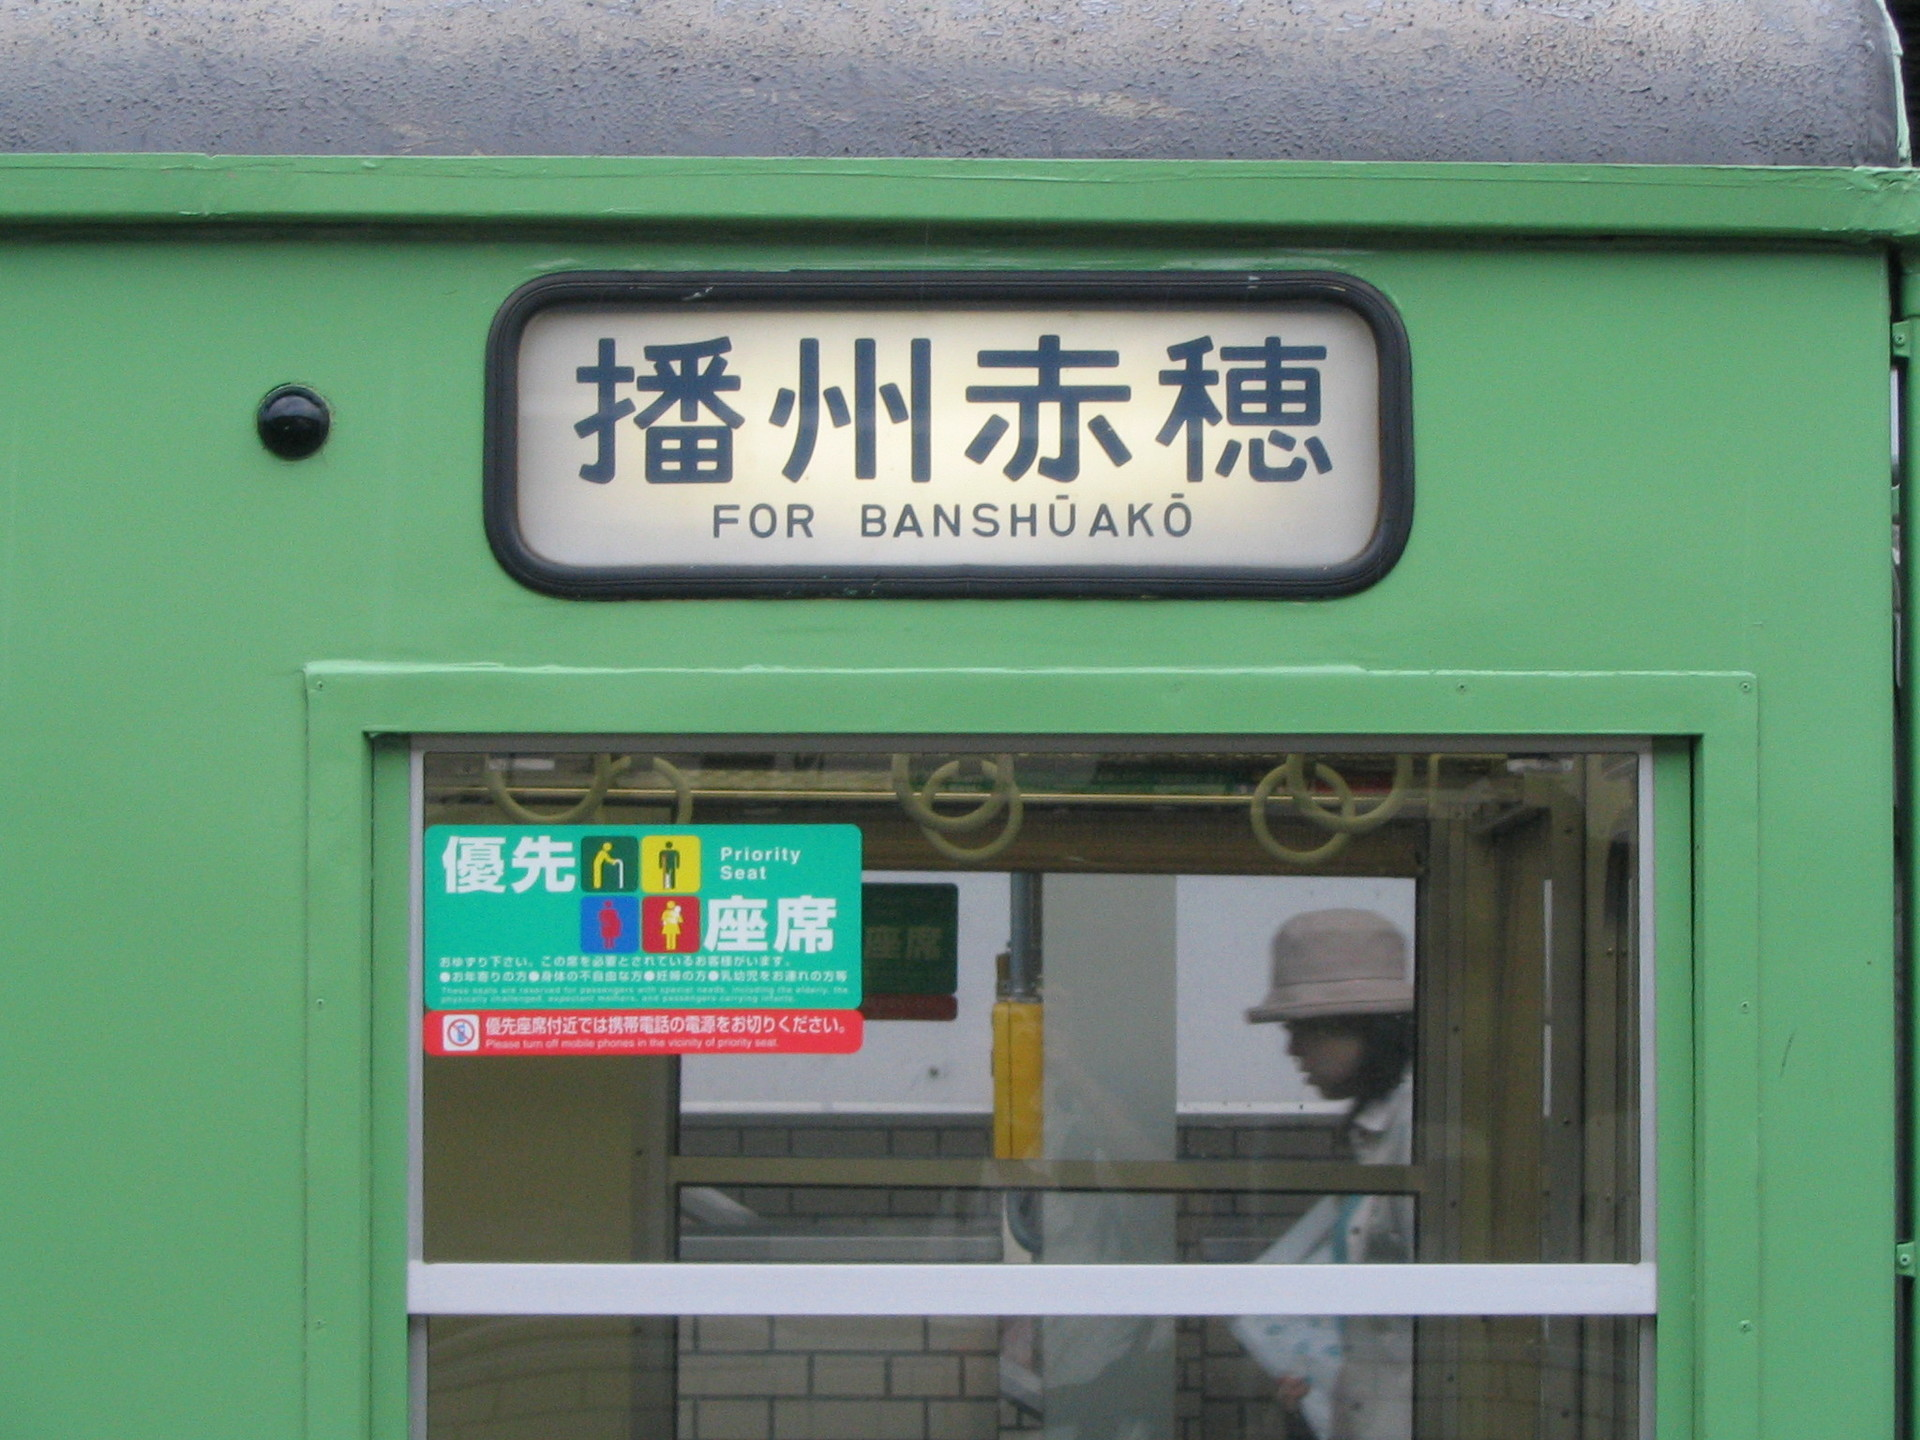 https://noruzo-tetsudo.up.seesaa.net/image/IMG_0848.JPG